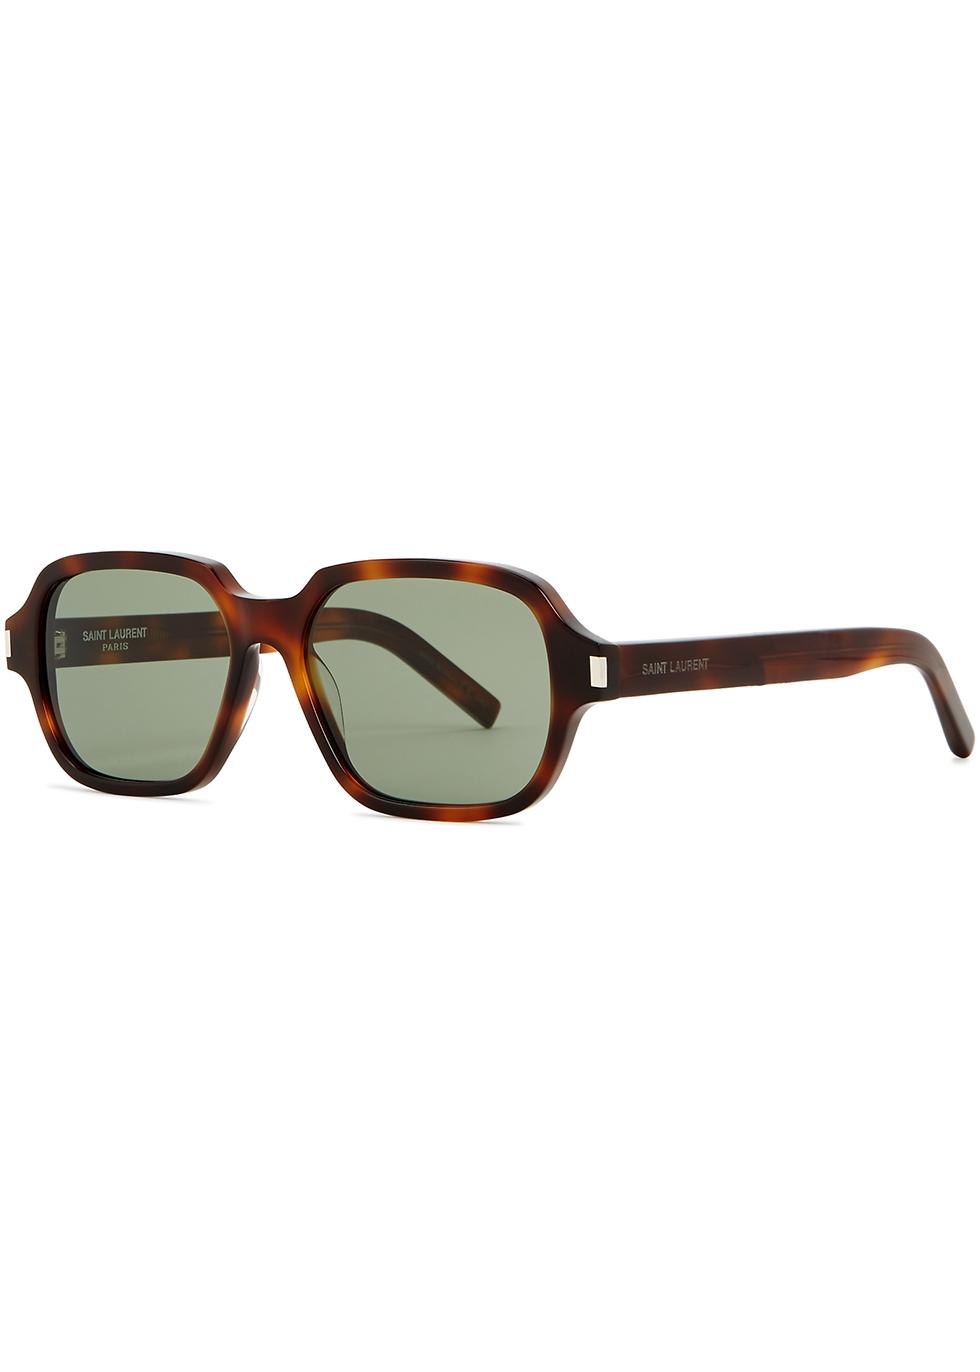 Classic SL 258 square-frame sunglasses - Saint Laurent